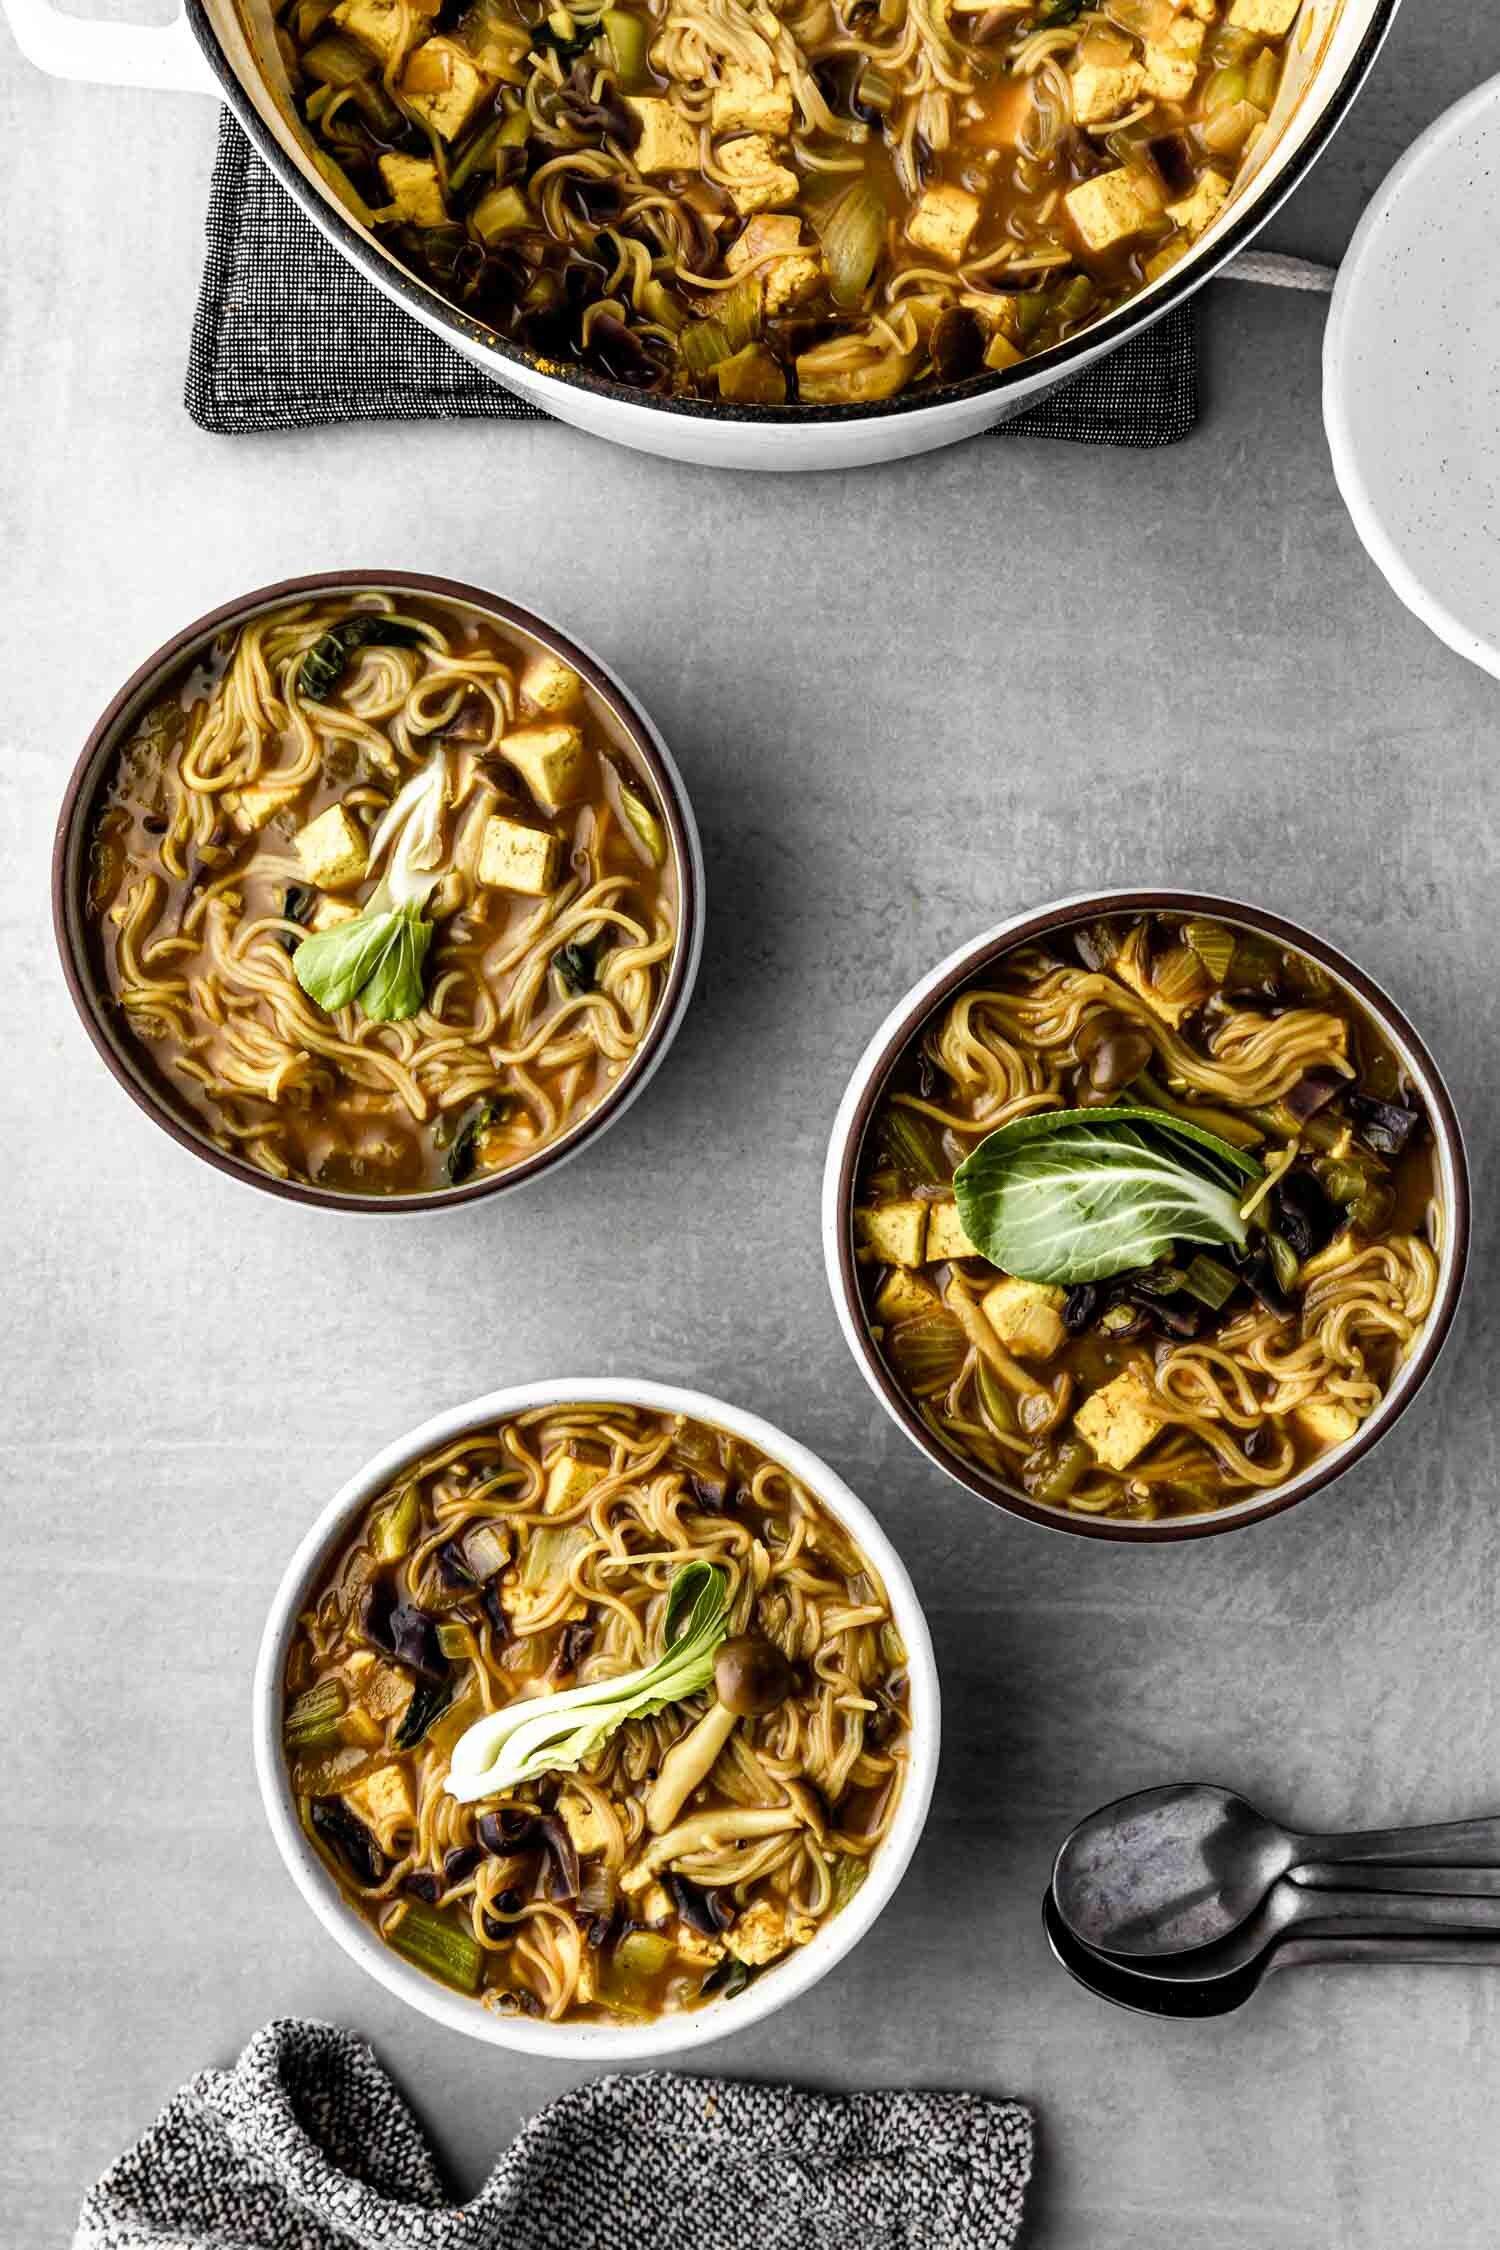 Quick Vegan Curry Ramen recipe, packed with veggies - by Beautiful Ingredient. #veganrecipe #curry #ramen #veggie #dinner #quickmeals #quickandeasydinnerrecipes #quickveganmeals #quickdinner #vegansoup #plantbasedsoup #plantbaseddinner #wfpbdinner #veggiepackedmeals #ramennoodlerecipes #curryramenrecipe #curryramen #veganramen #vegansoup